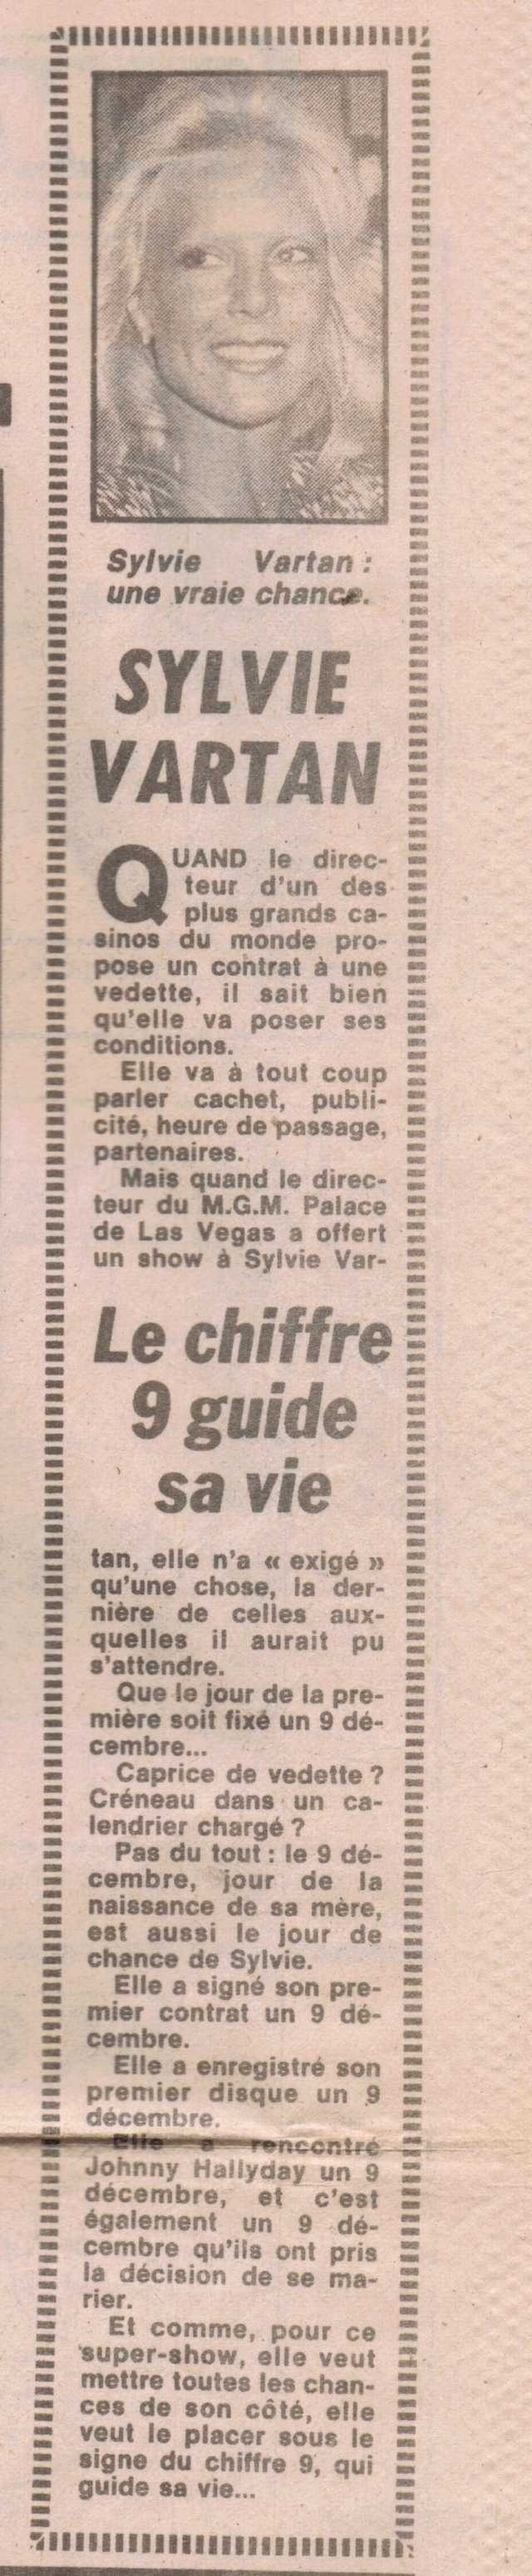 Discographie N° 81 MARATHON WOMAN France43